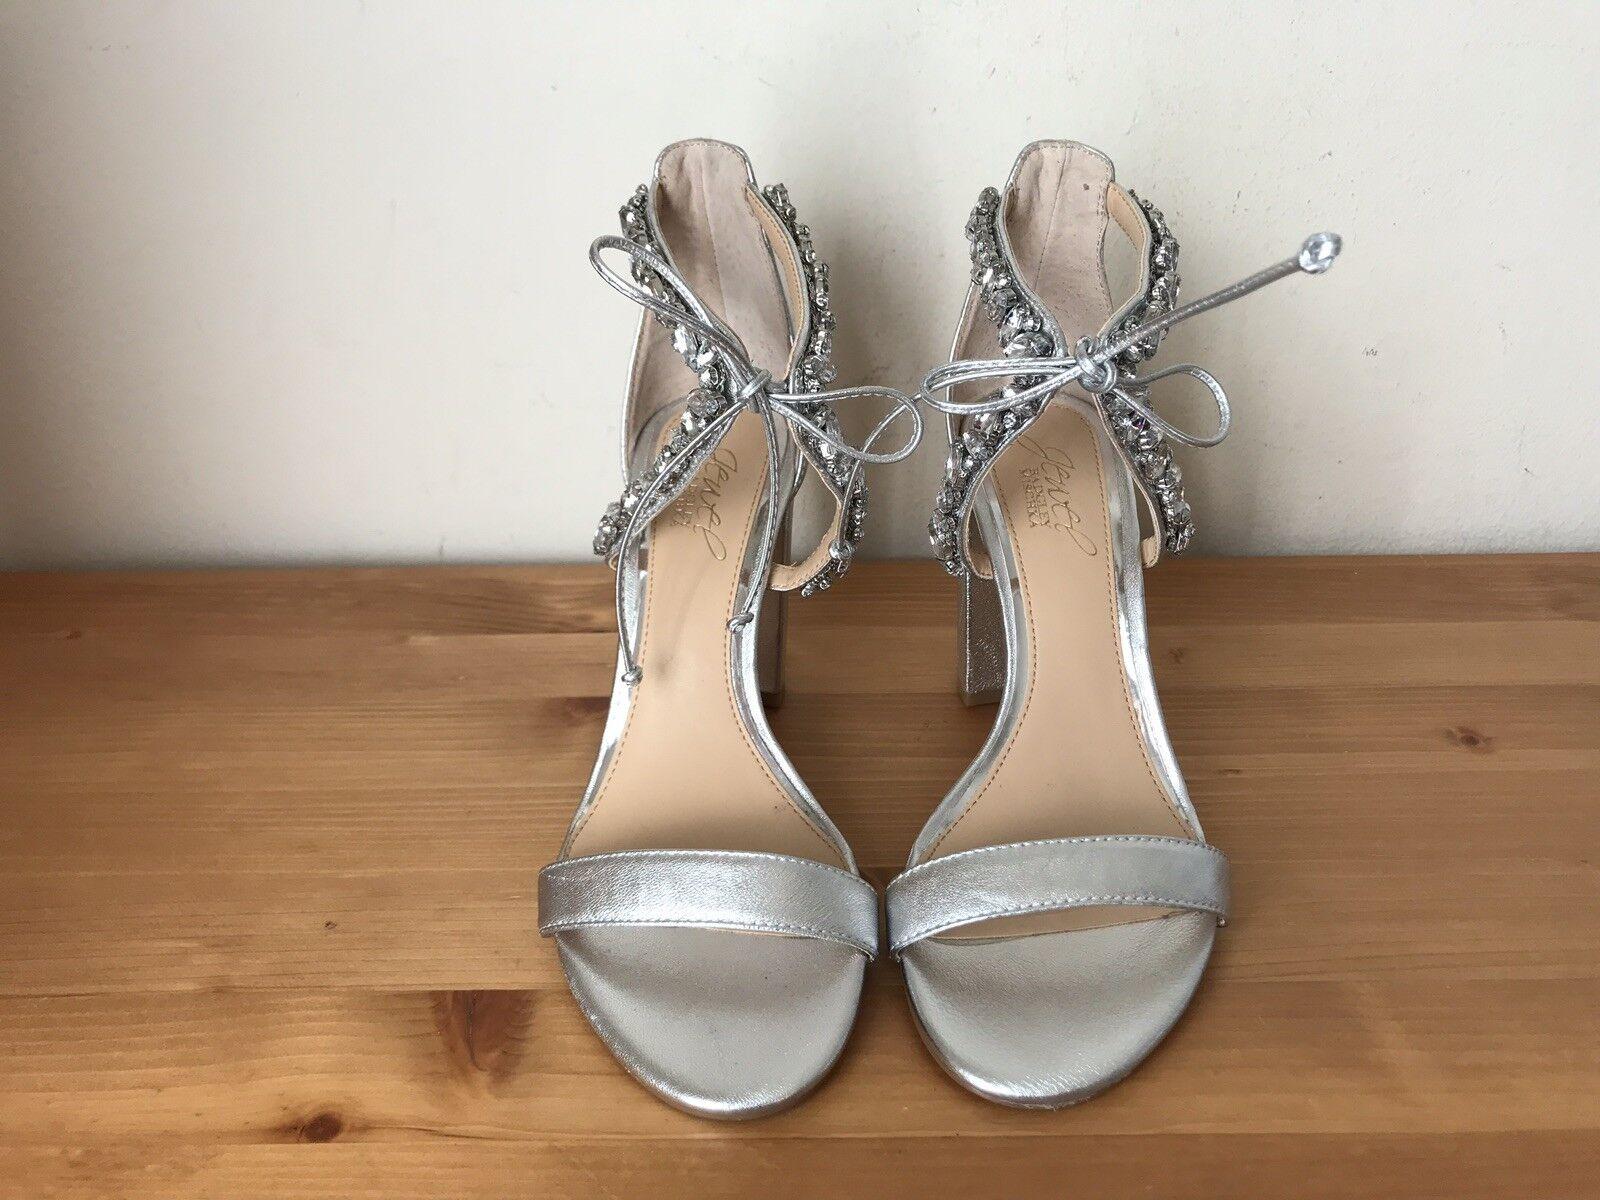 Affichage Bijou Badgley Mischka en Cuir Argenté Bride Cheville Sandales Chaussures Sz 9